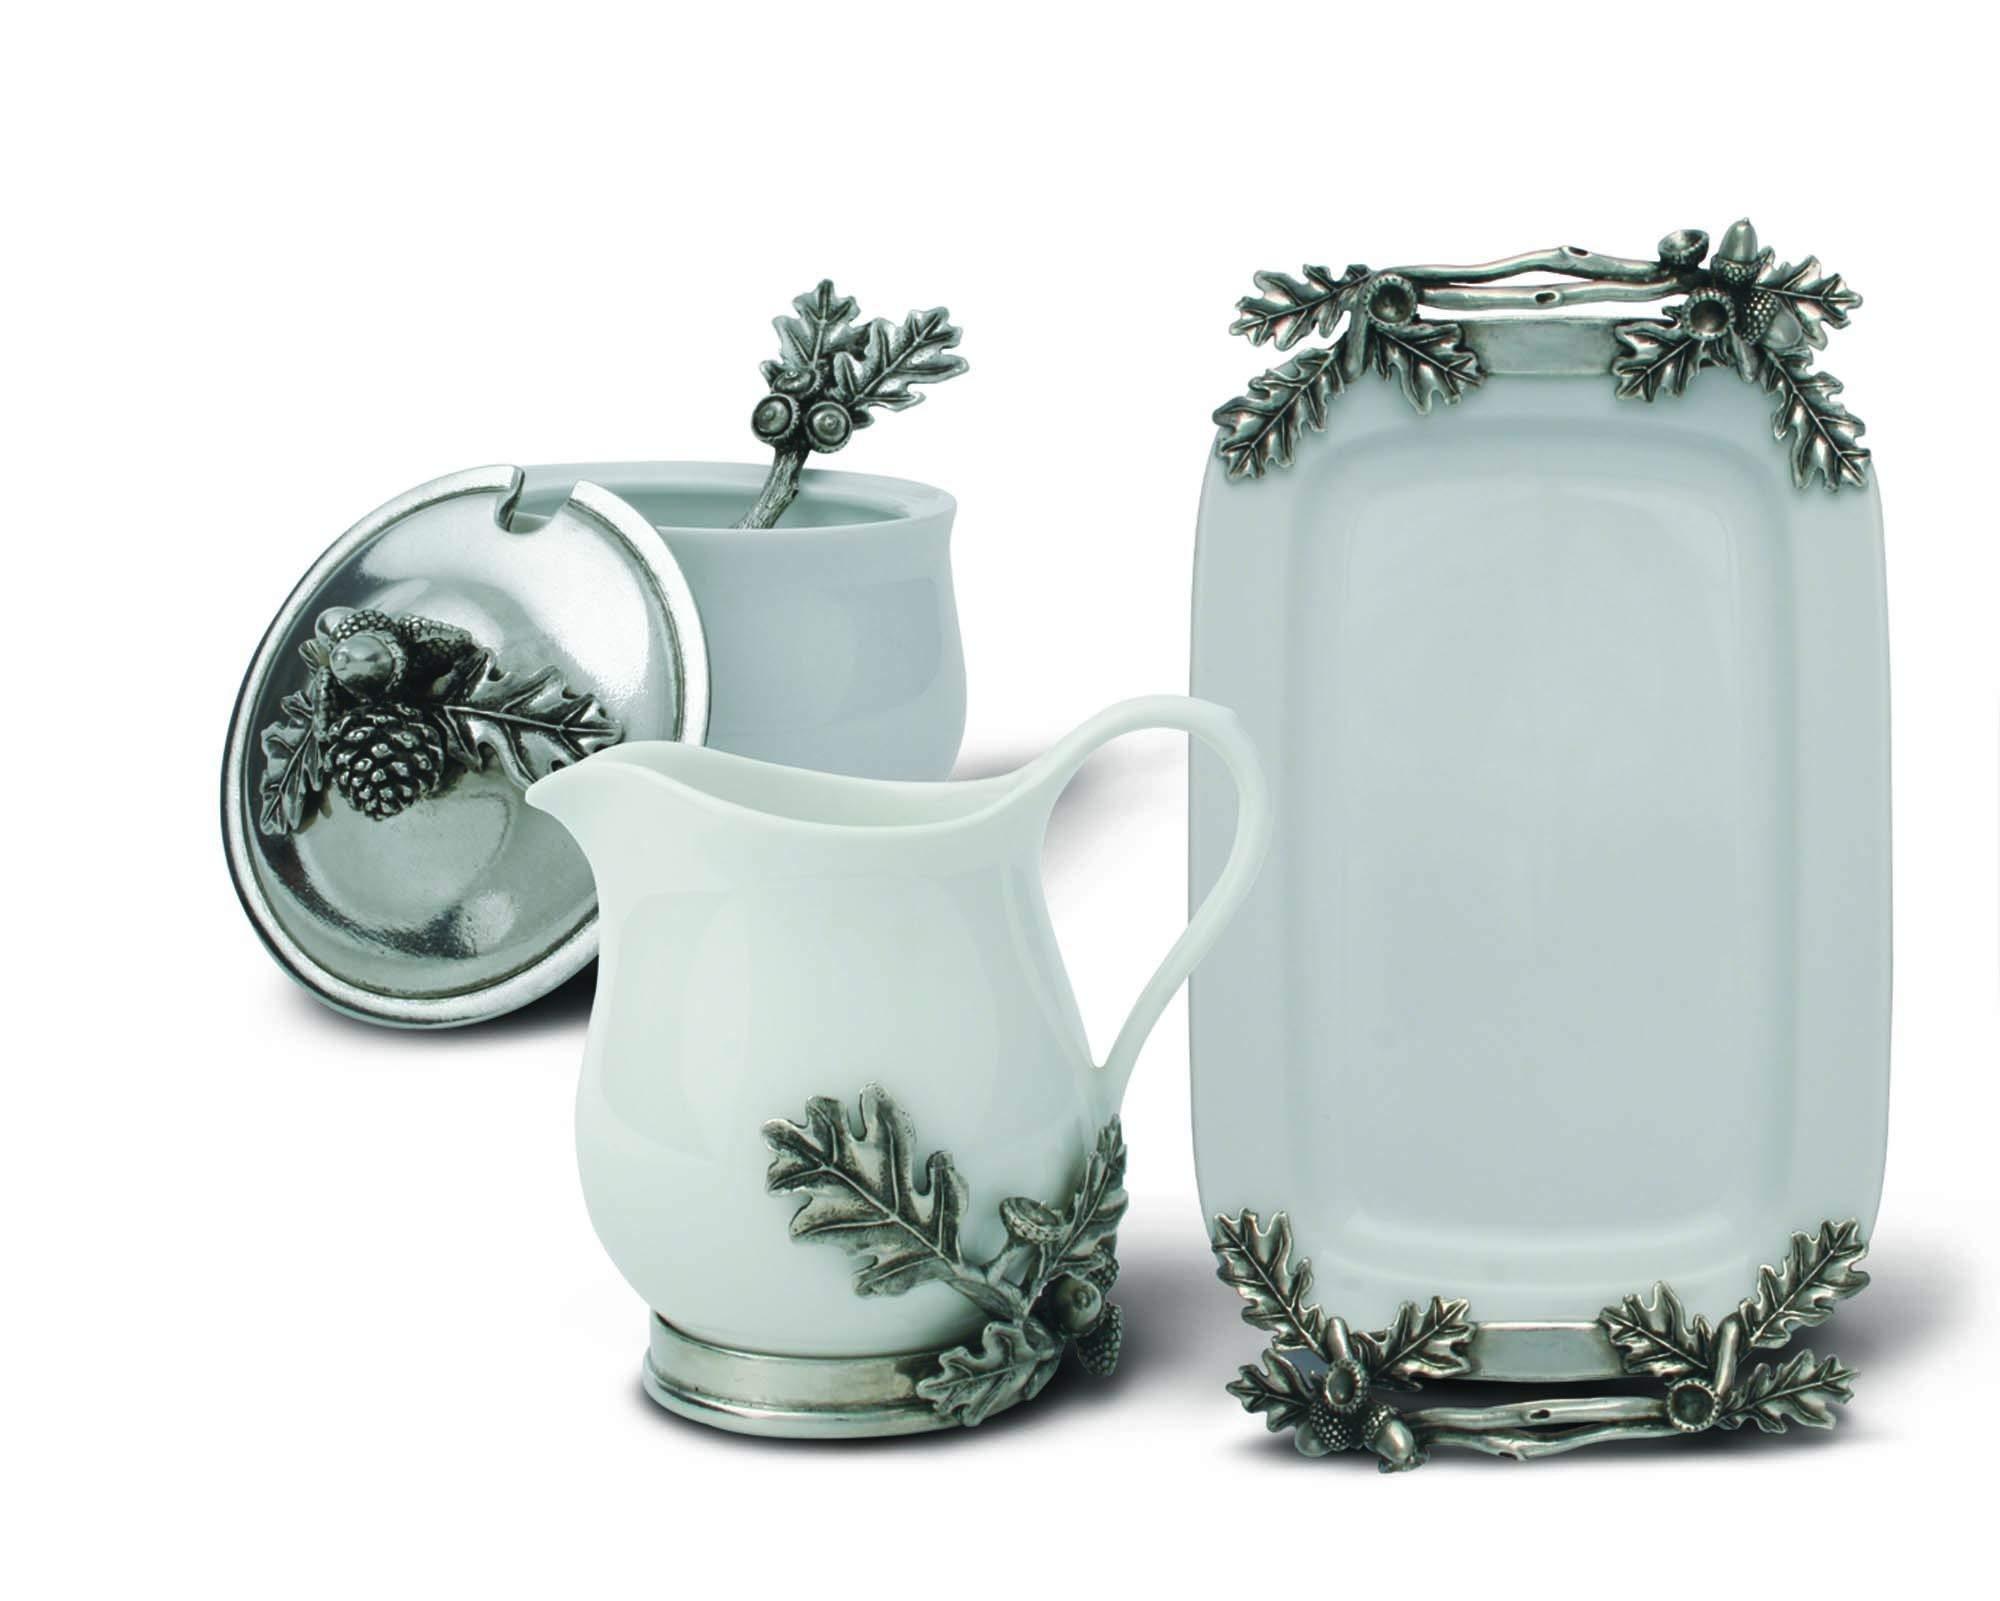 Vagabond House Stoneware Creamer Set - Pewter Acorn & Oak Leaf 12.25'' Long